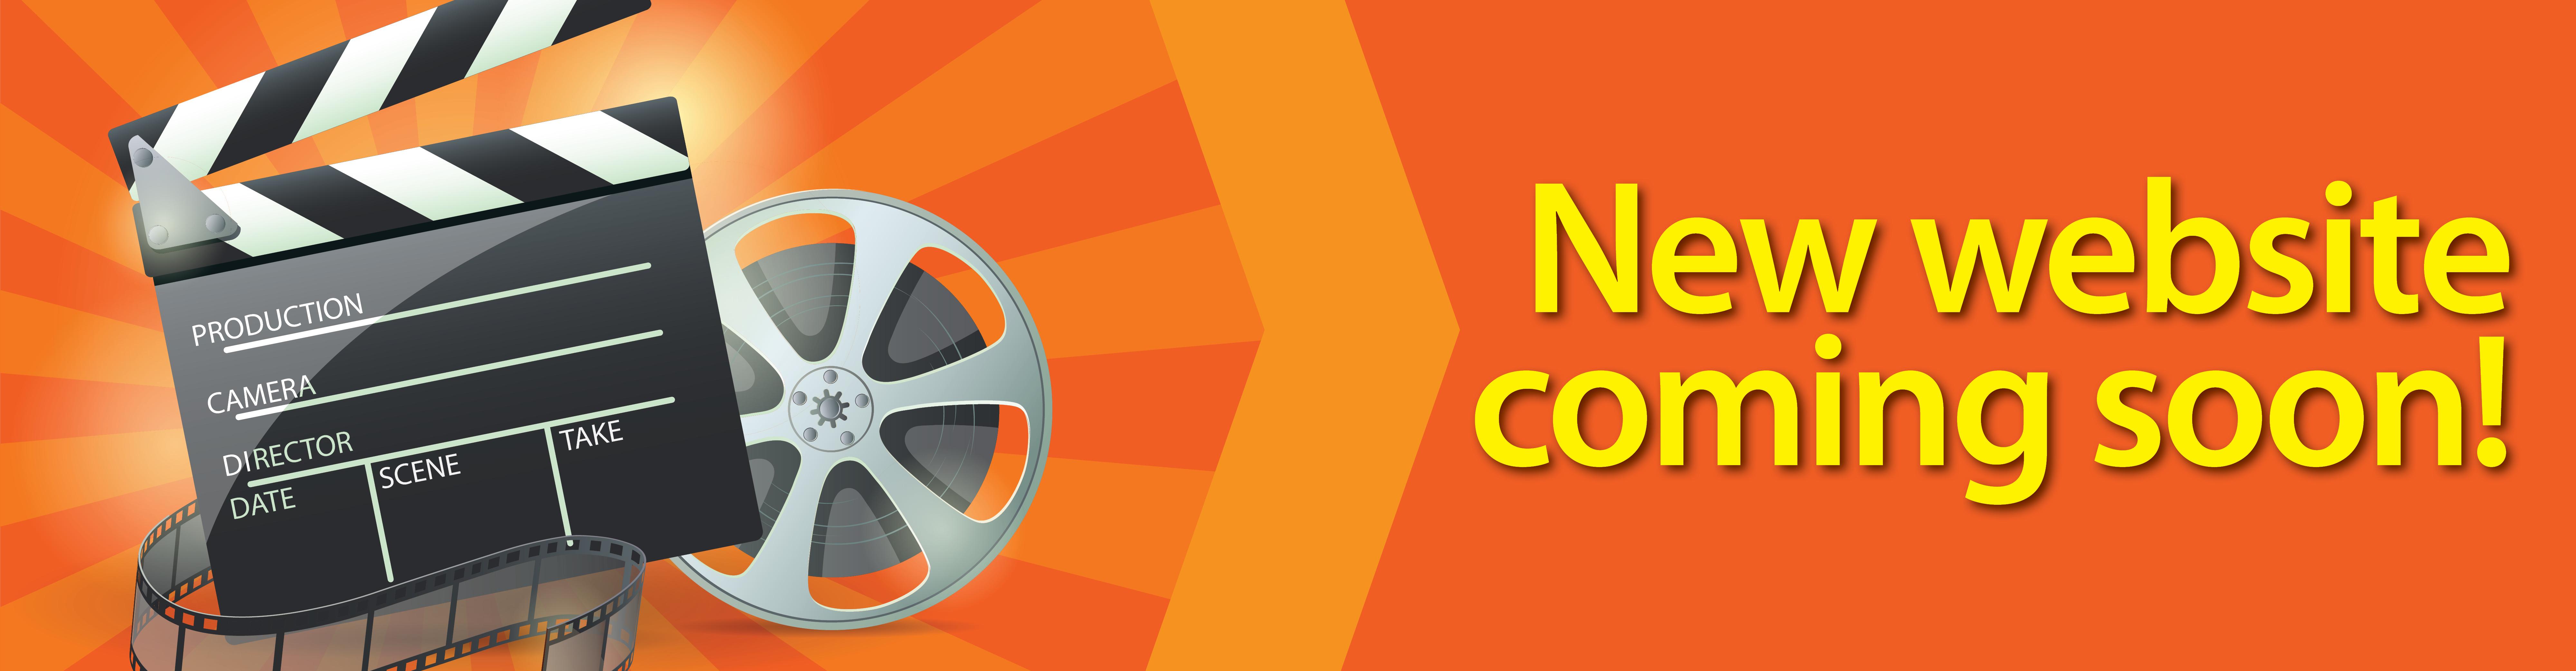 1o4cyftmeanxlzuqw4gm+new_website_coming_soon_web_banner2